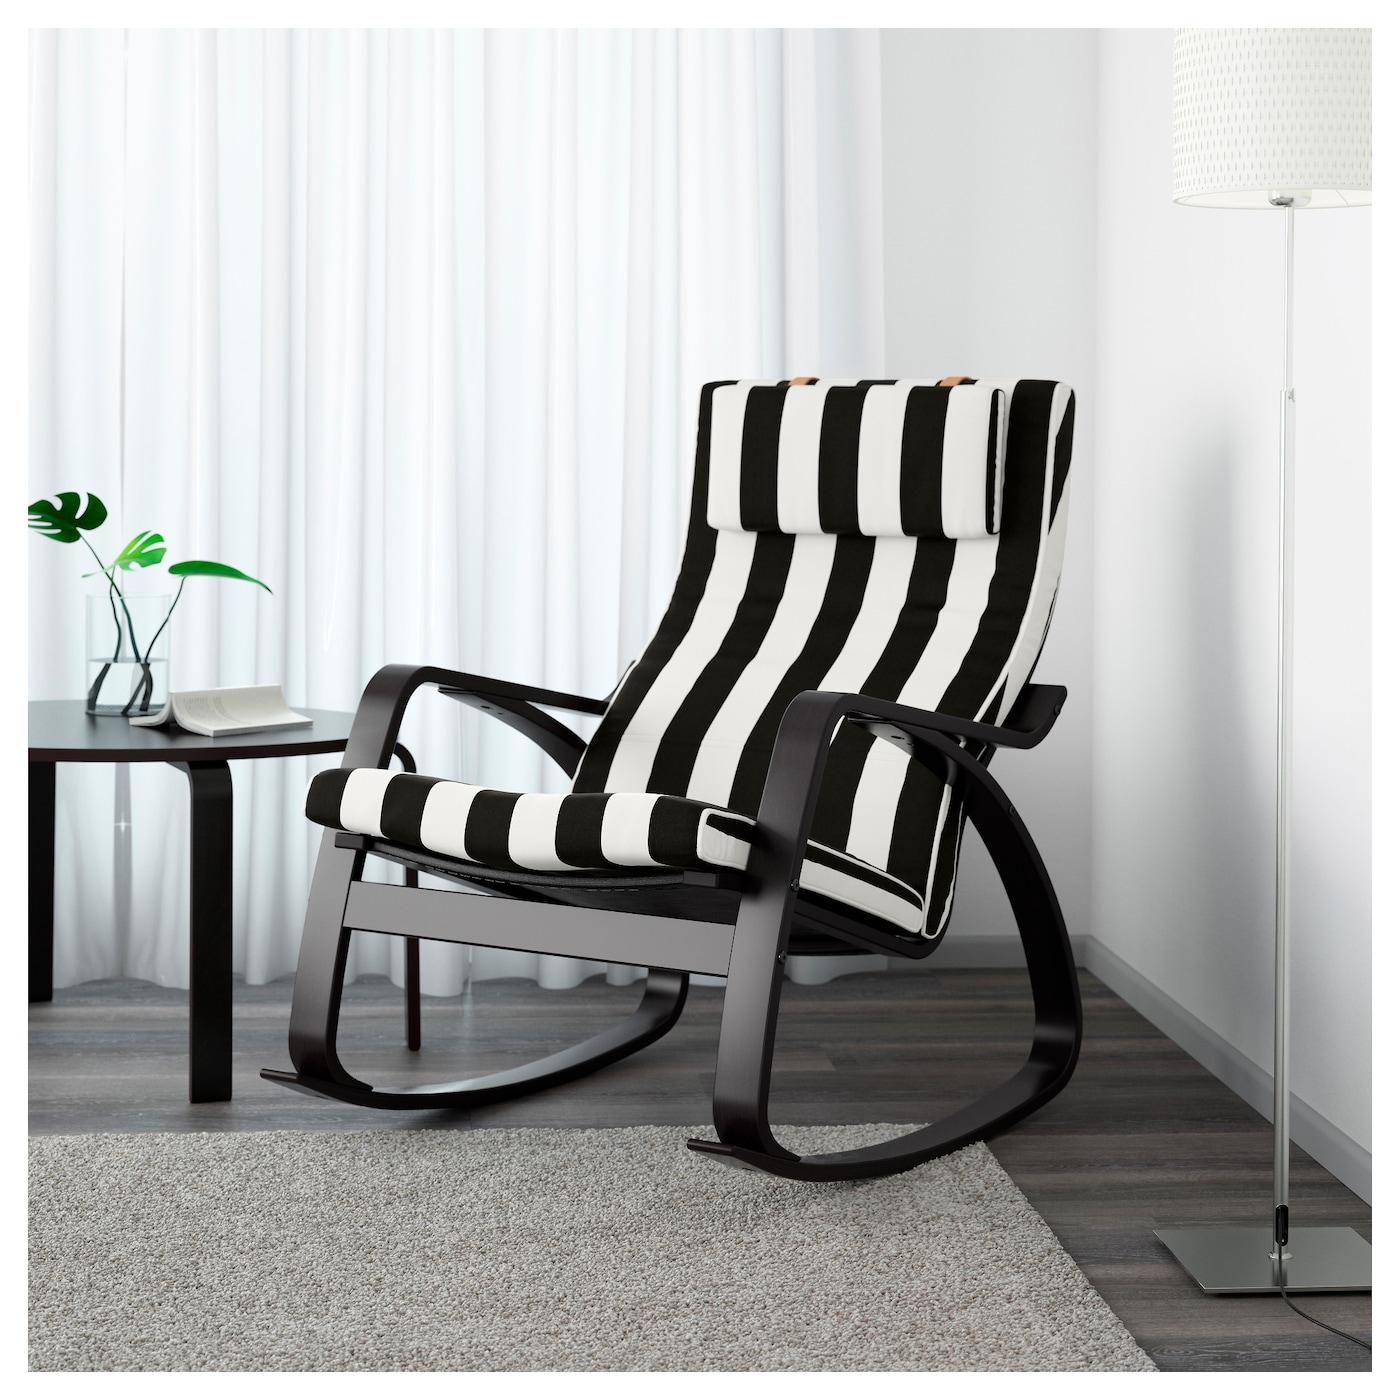 "poa""ng rocking chair black brown stenli black white ikea"